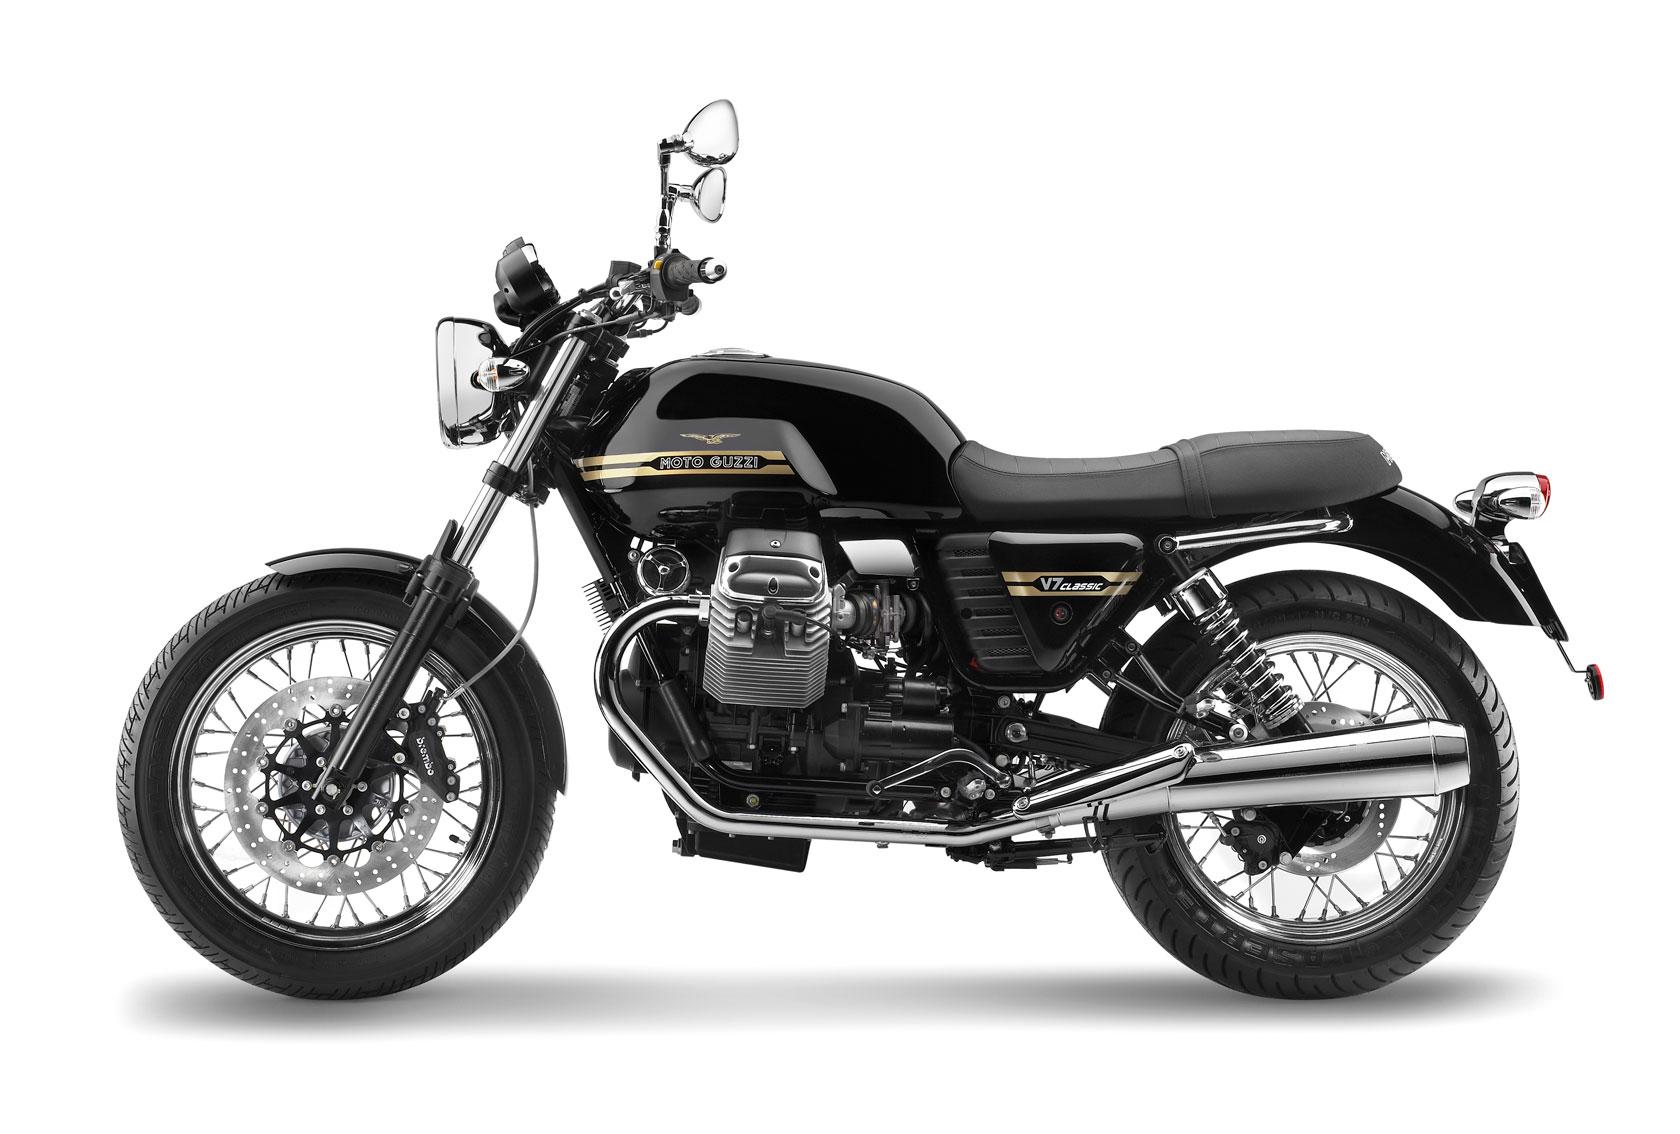 2020 Moto Guzzi V7 III Racer 10th Anniversary Guide